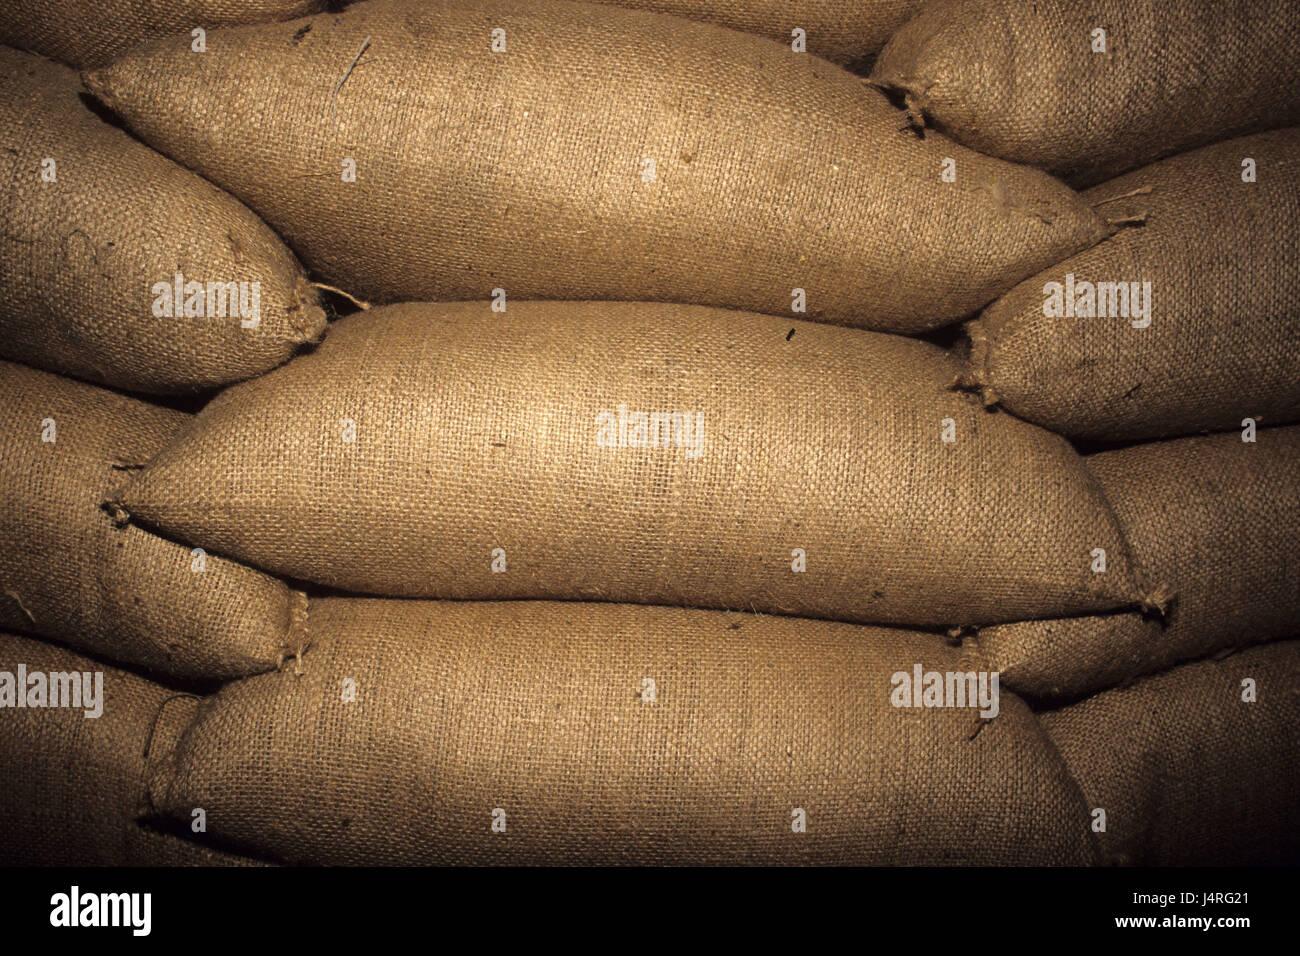 Costa Rica, San Isidro de tablespoons general, coffee bags, - Stock Image